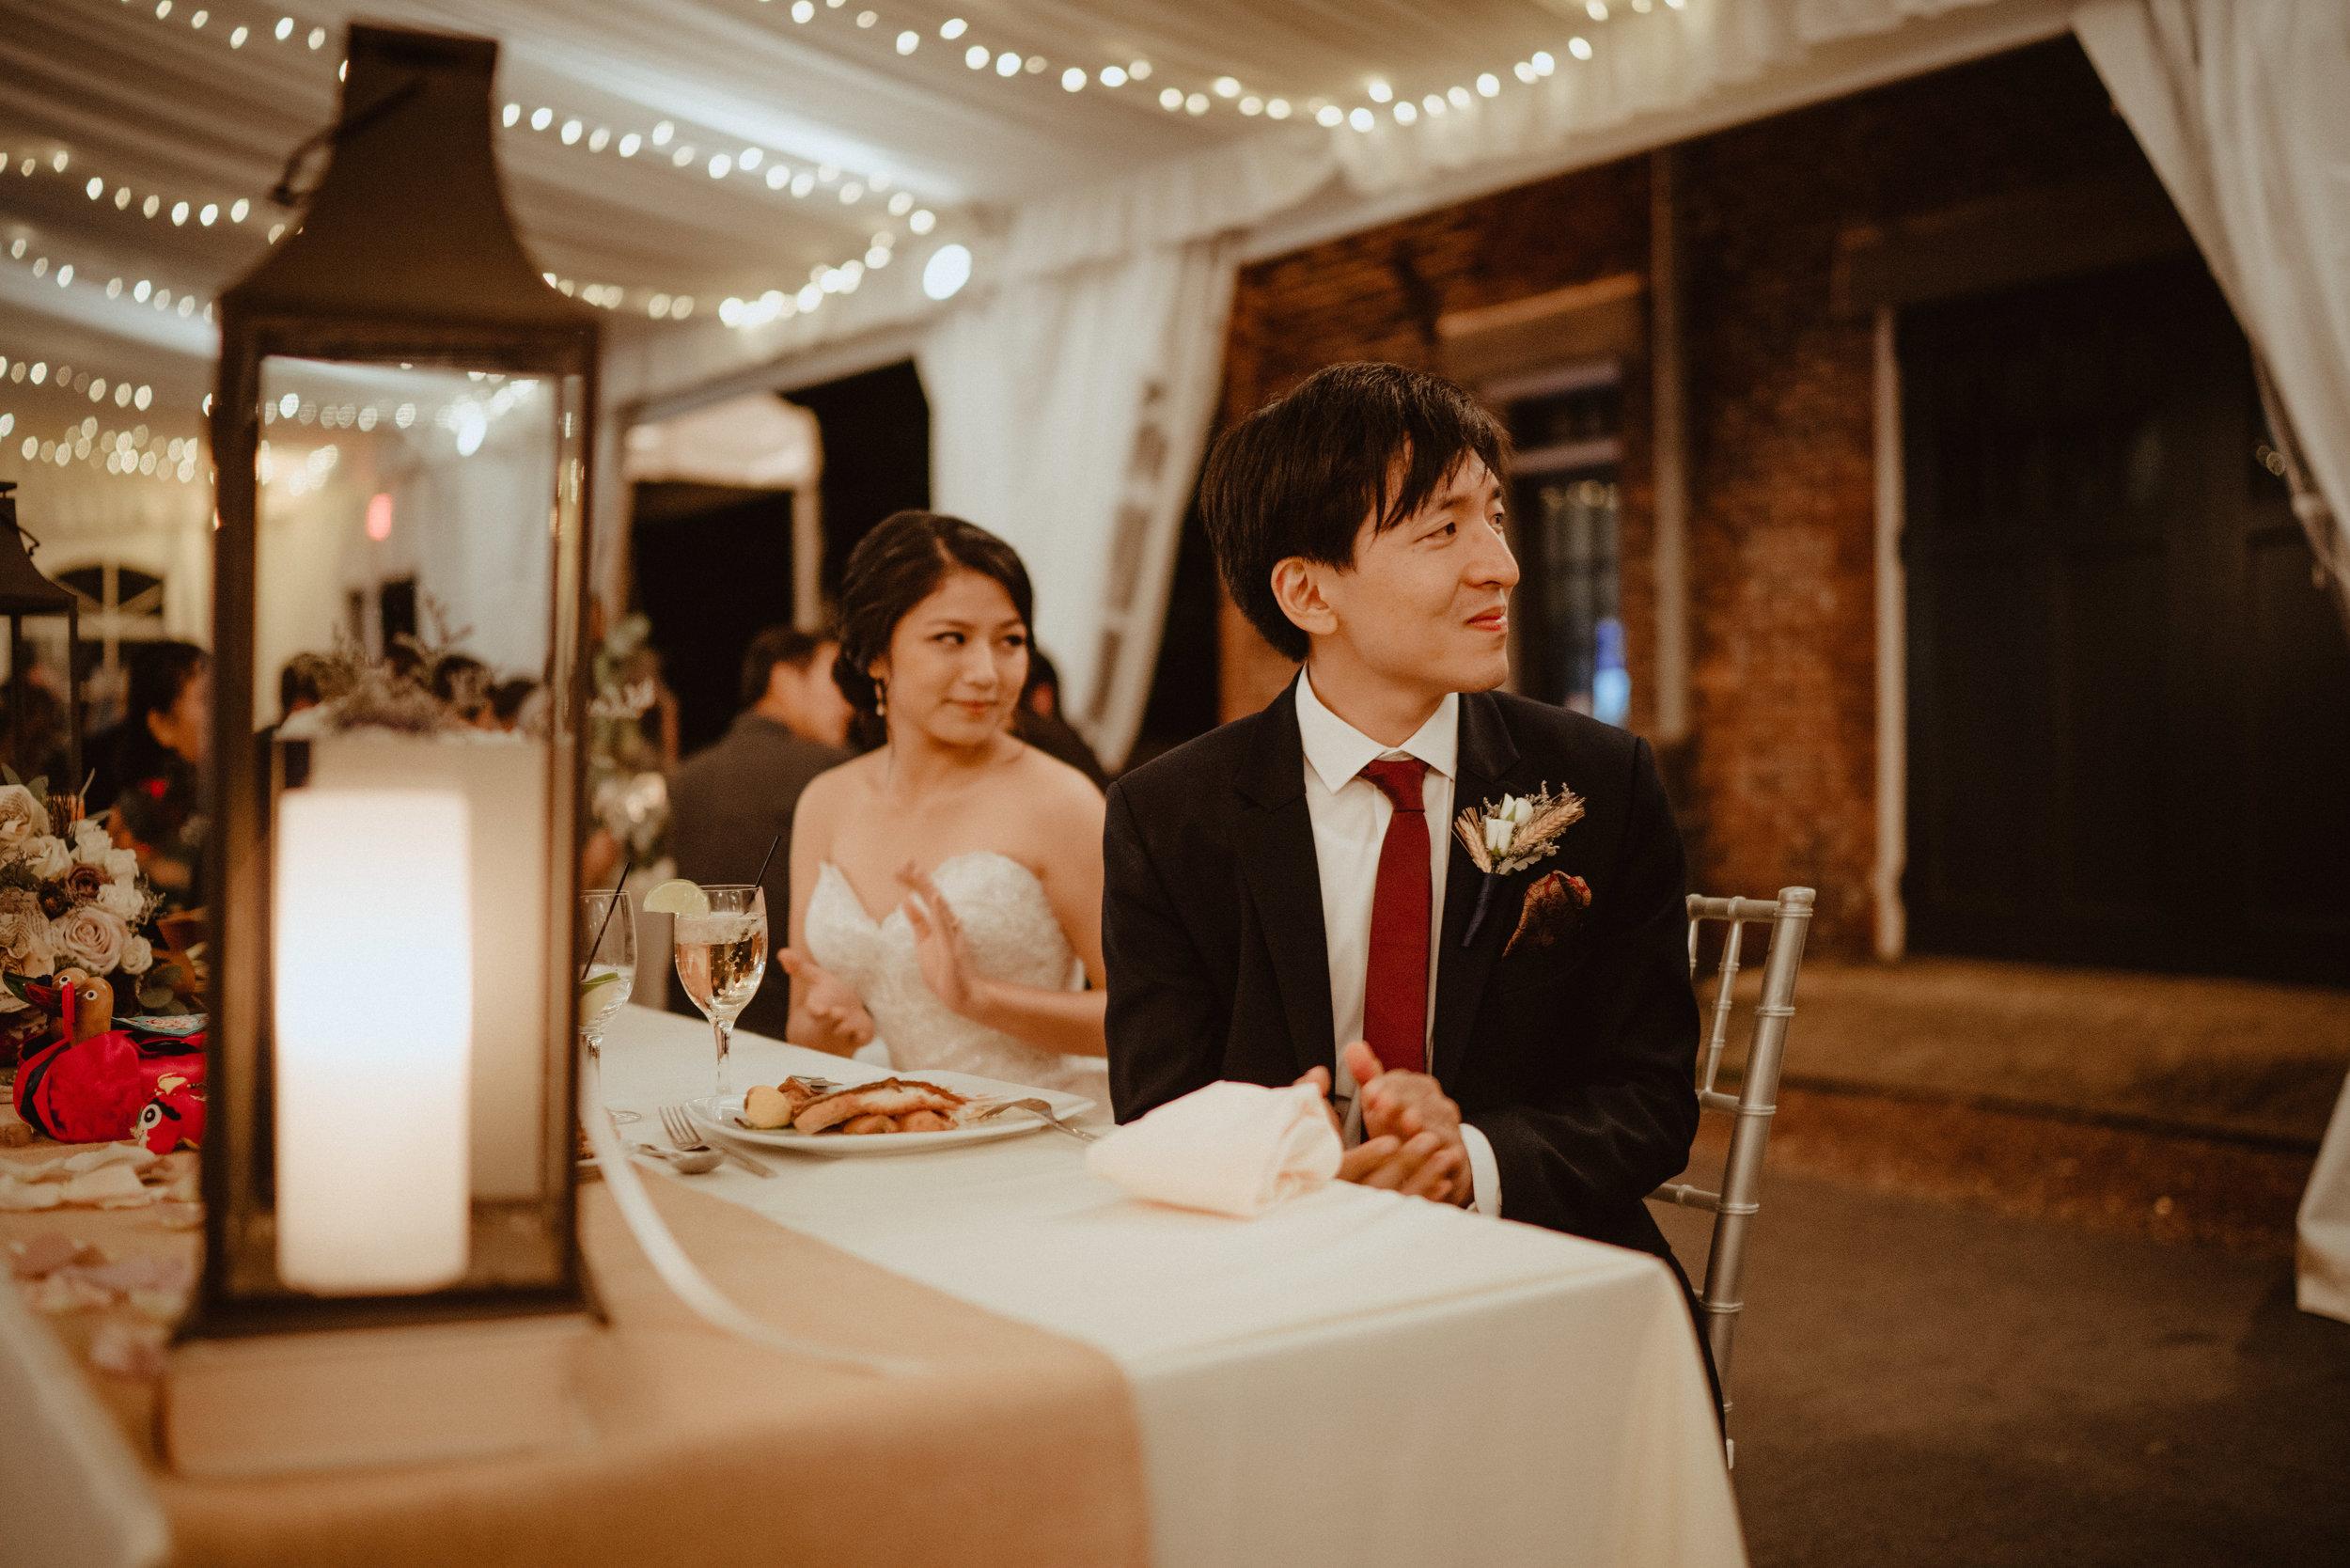 Irene-and-Jae-2019_Brooklyn_Wedding_Photographer_Chellise_Michael_Photography--130.jpg